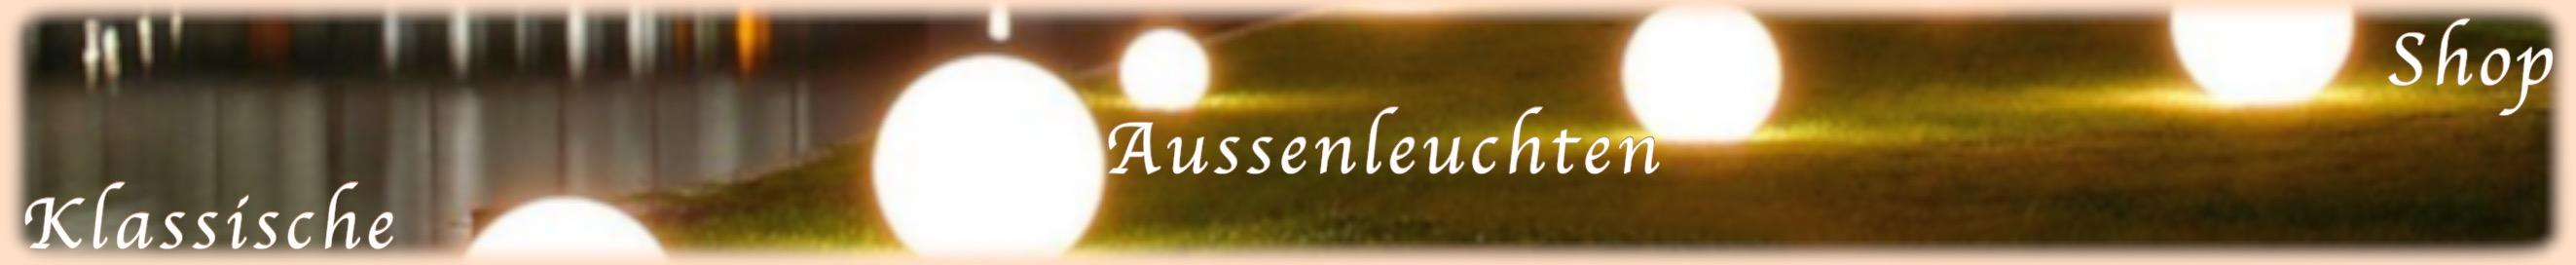 Klassische-Aussenleuchten.de-Shop-Logo